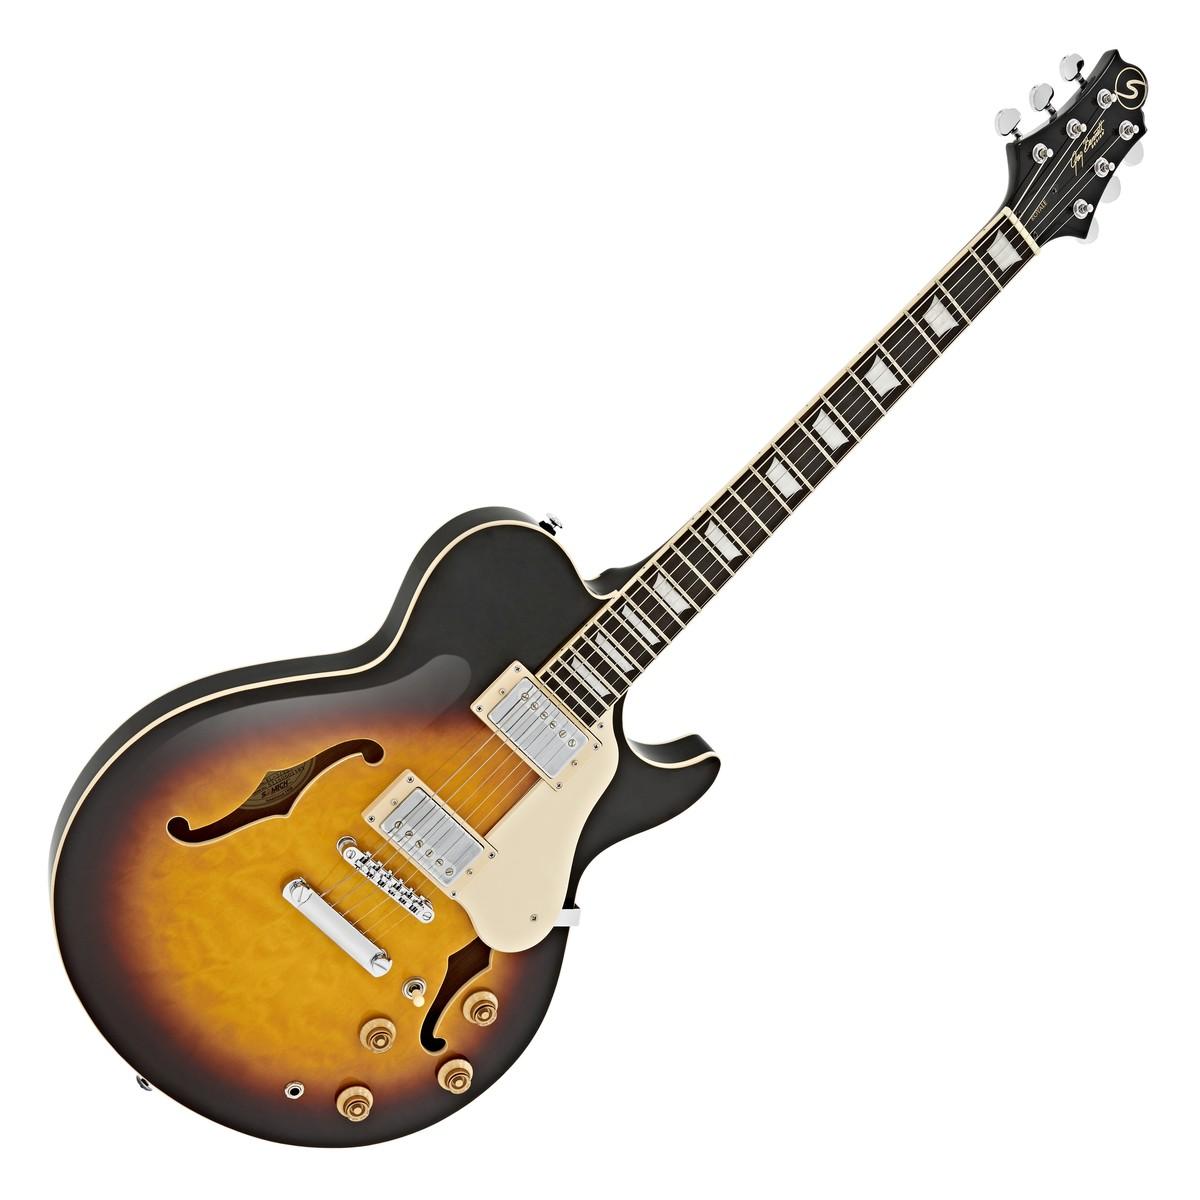 Greg Bennett Electric Guitars : greg bennett royale rl 3 electric guitar vintage sunburst at ~ Vivirlamusica.com Haus und Dekorationen